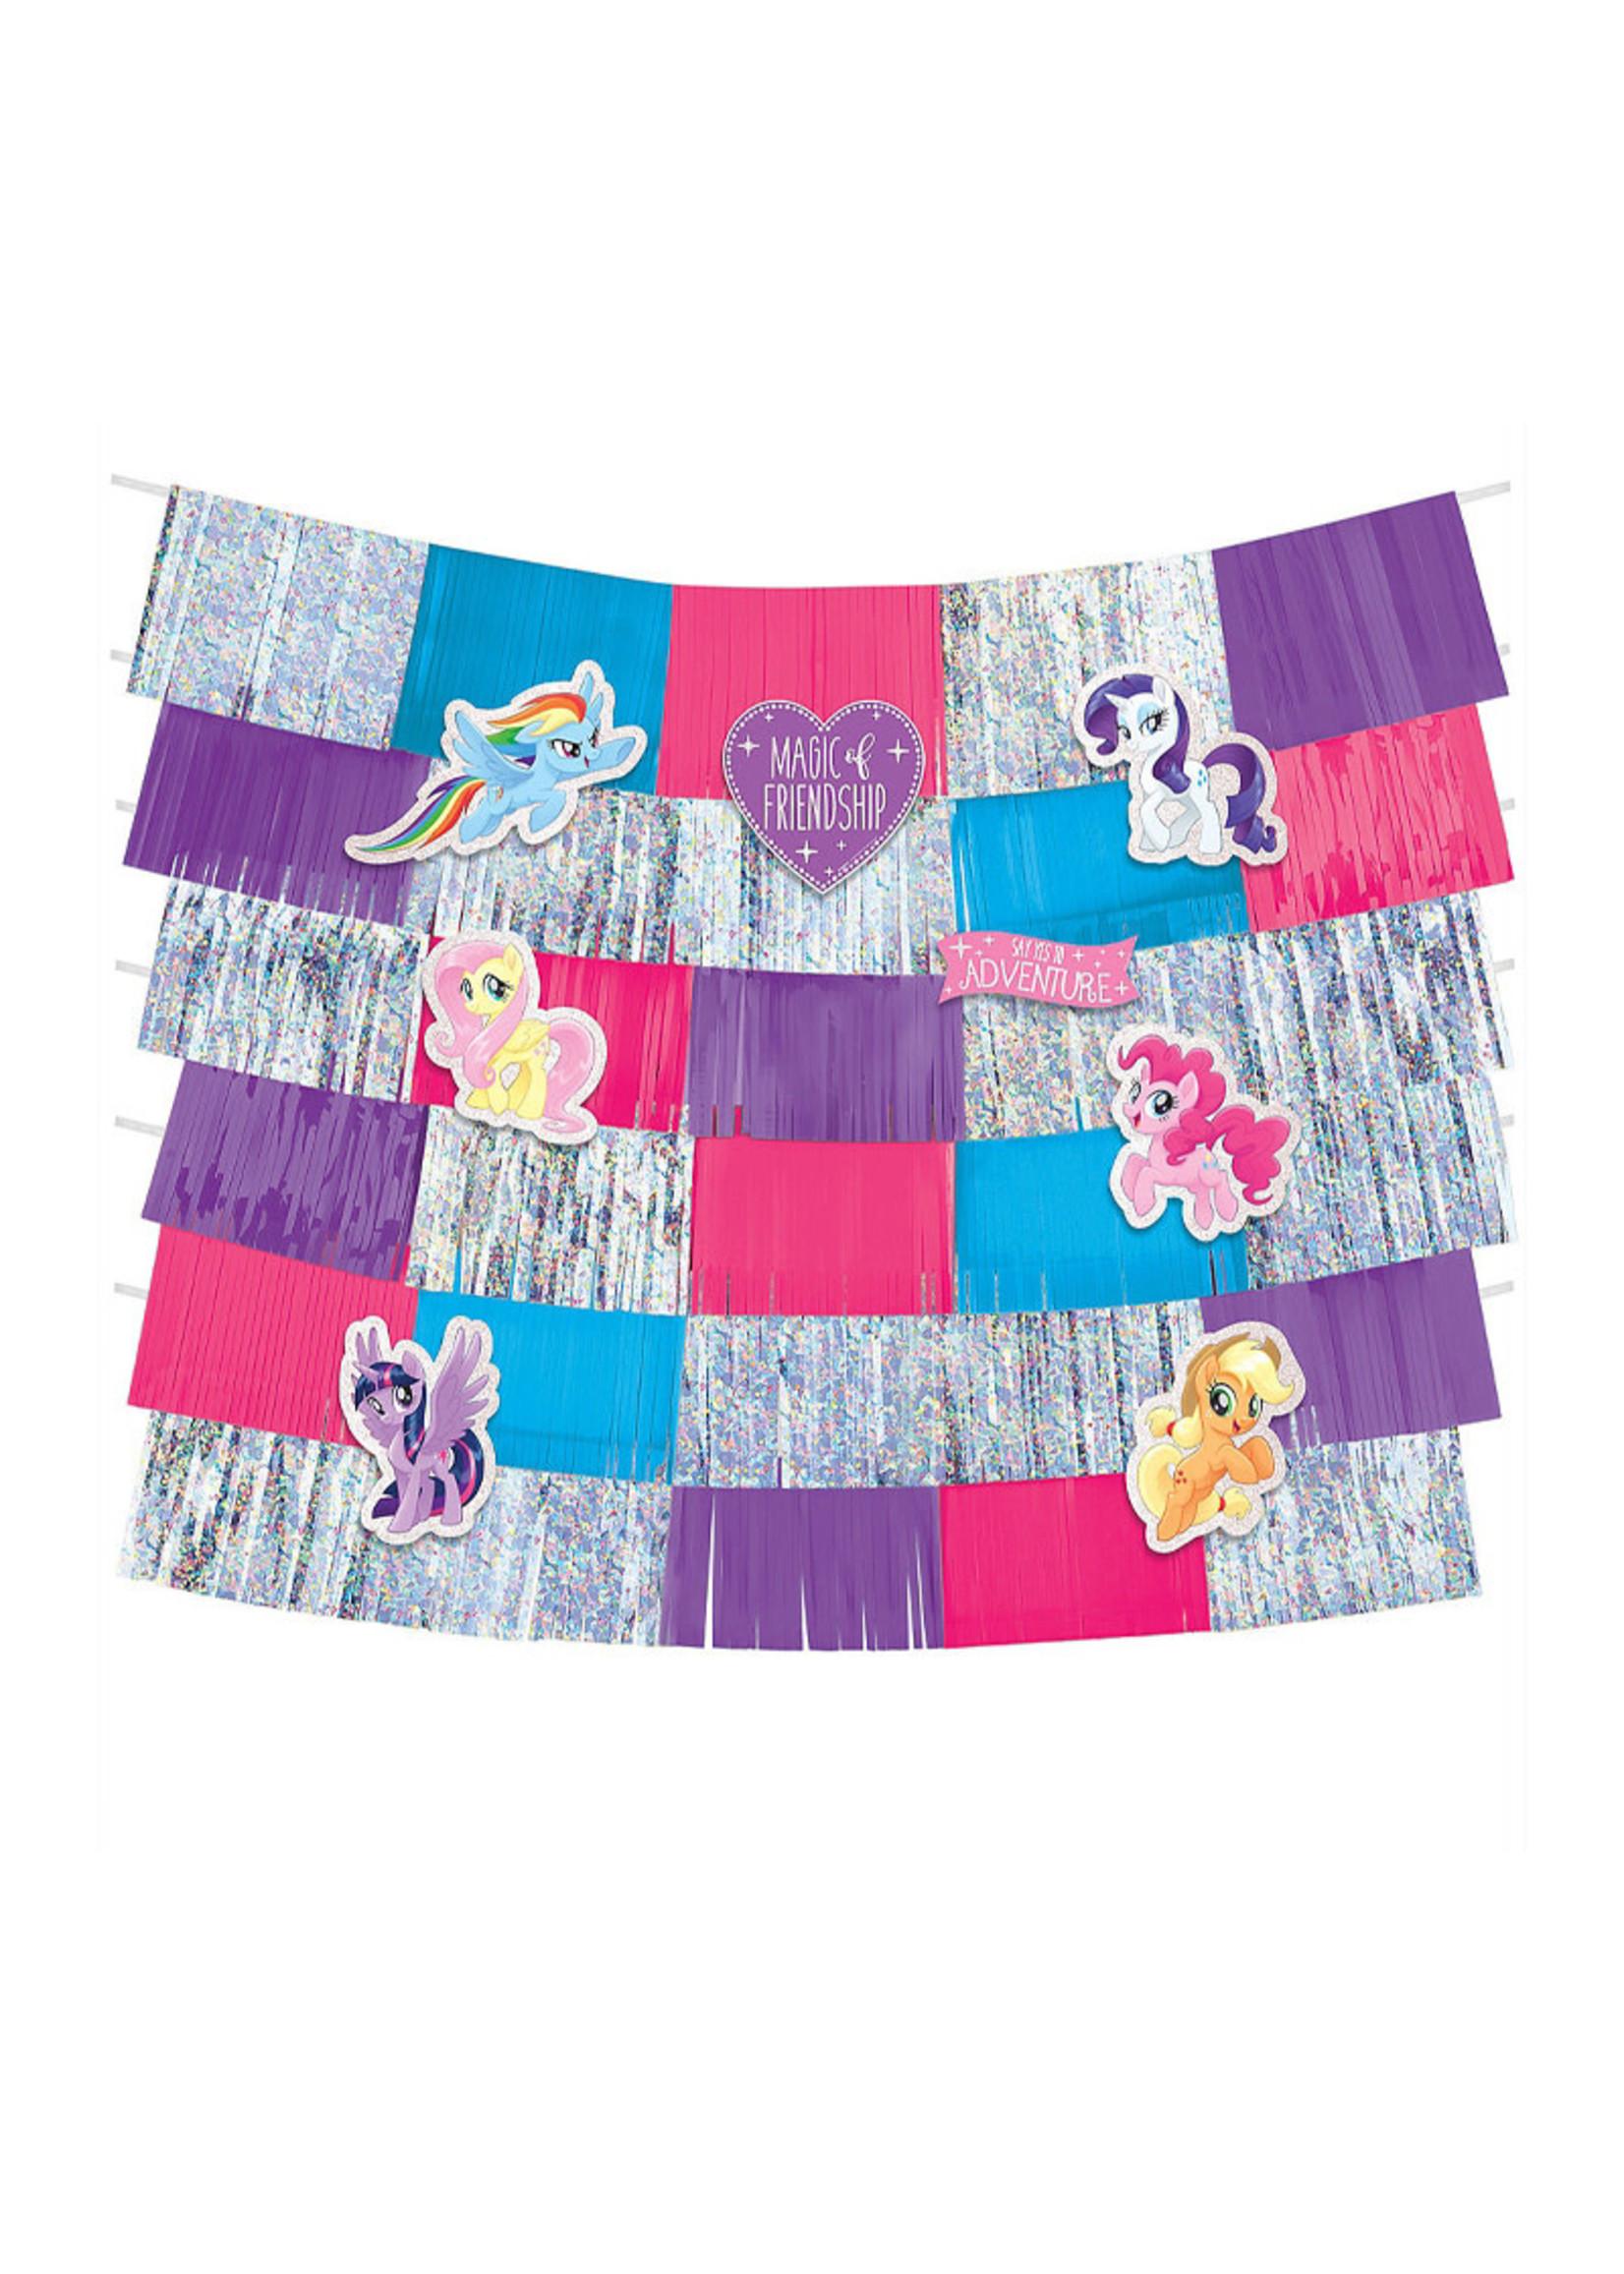 Friendship Adventures My Little Pony Backdrop Kit